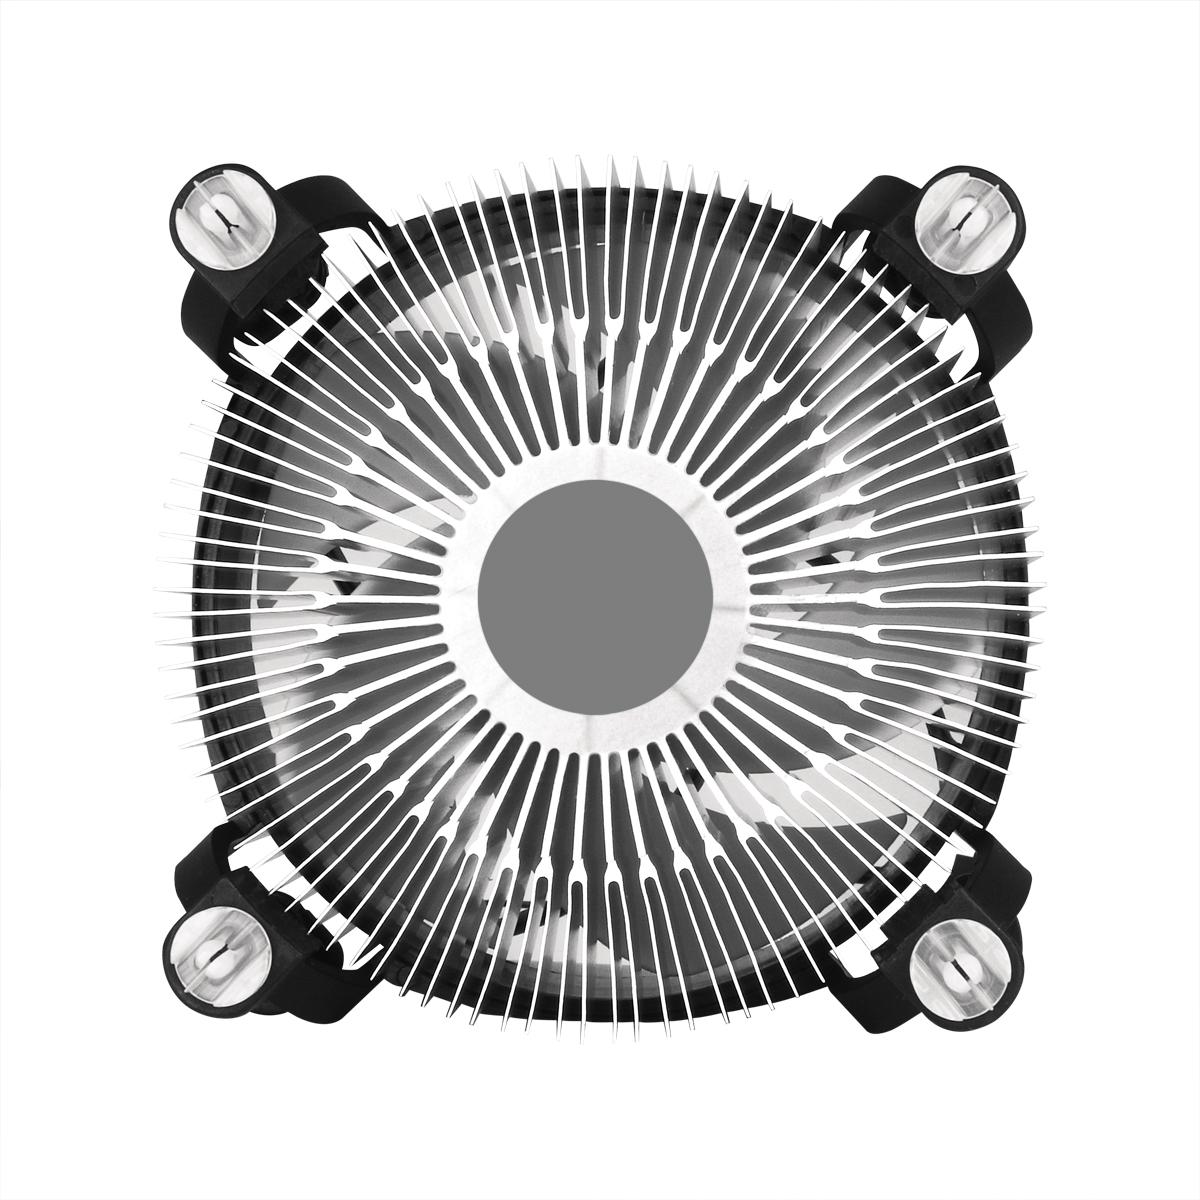 Kompakter Intel CPU-Kühler ARCTIC Alpine 12 Rückansicht